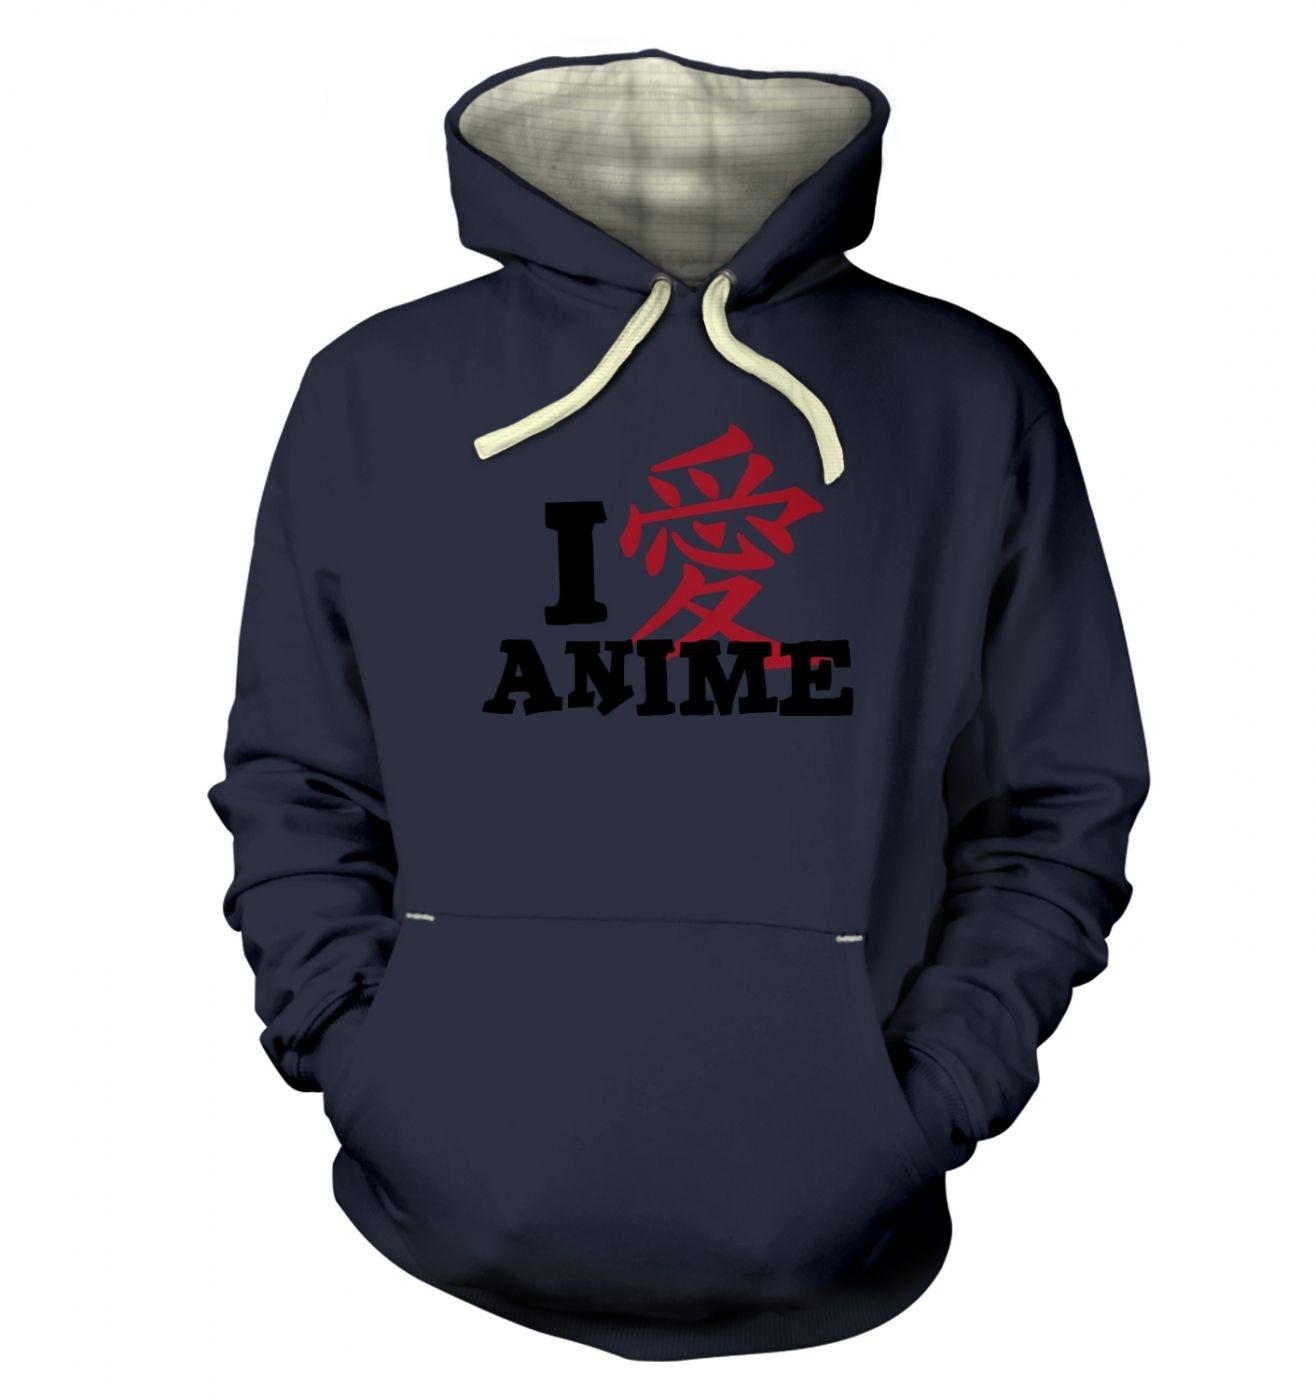 I Love Anime! premium hoodie